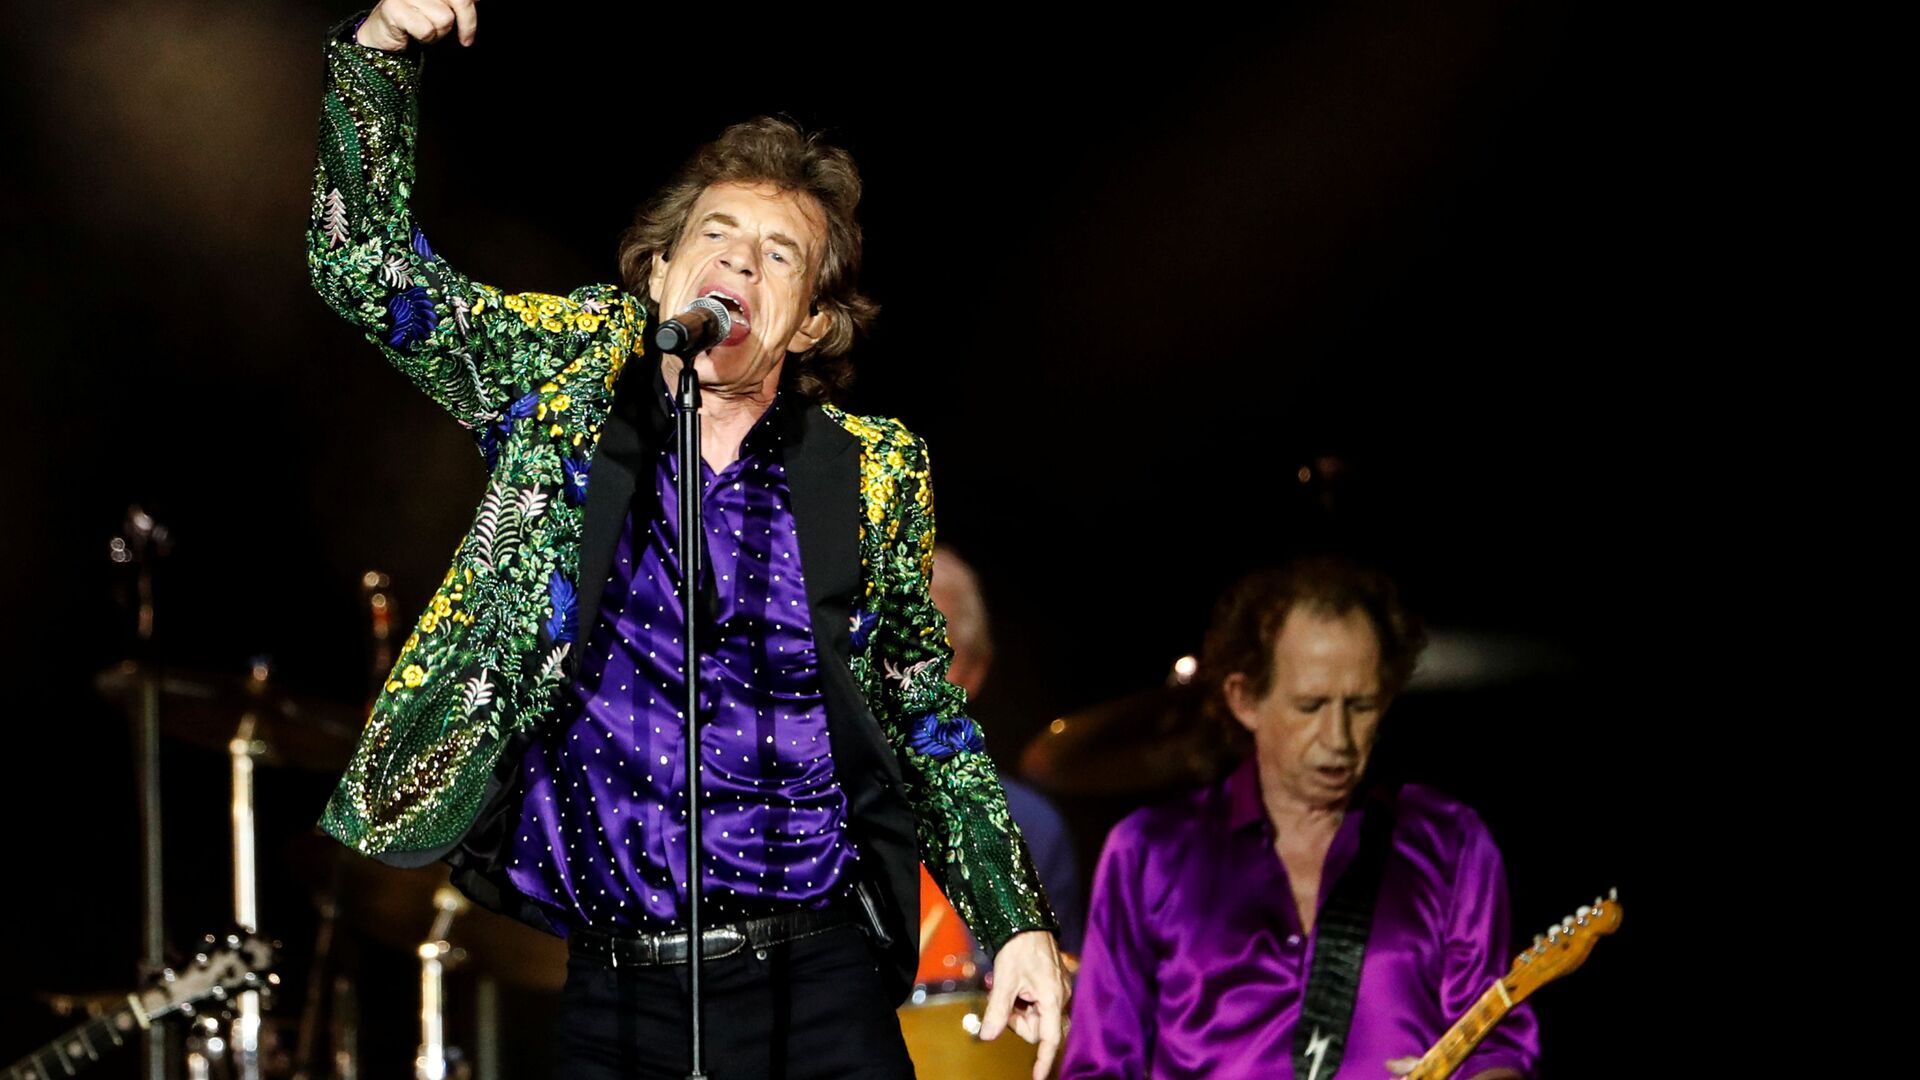 L'esibizione di The Rolling Stones - Sputnik Italia, 1920, 24.08.2021